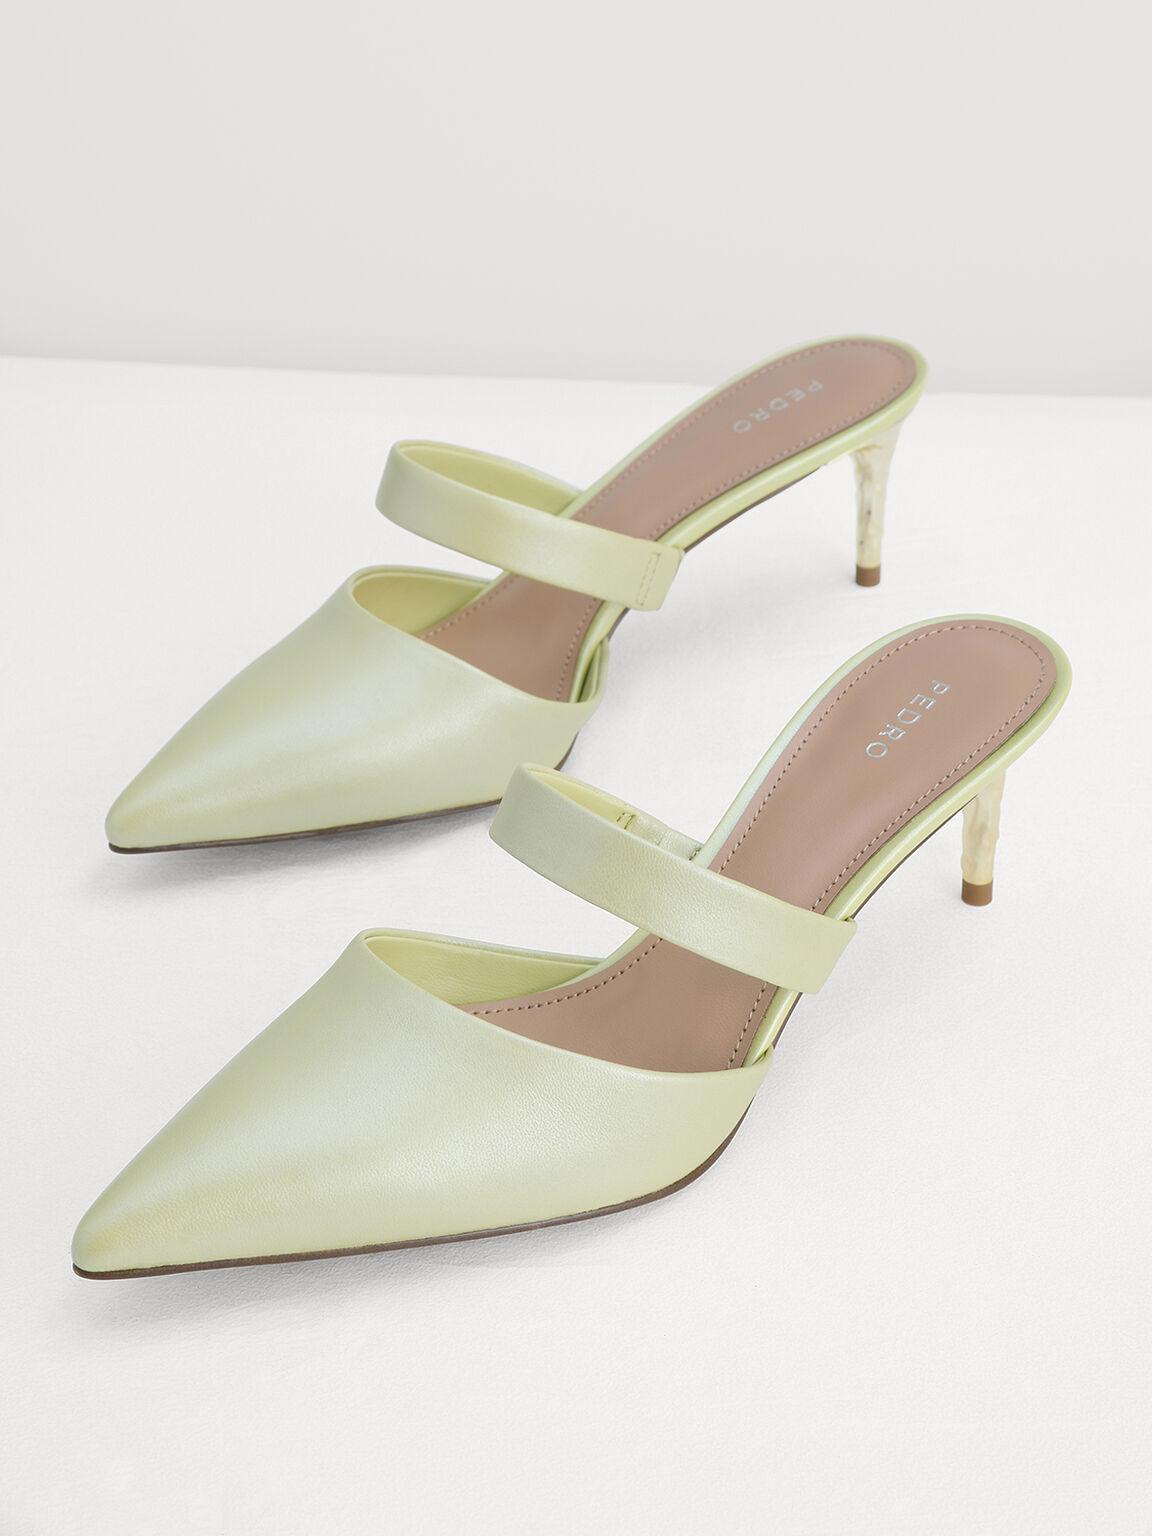 Pearlised Leather Slip-On Heels, Light Green, hi-res